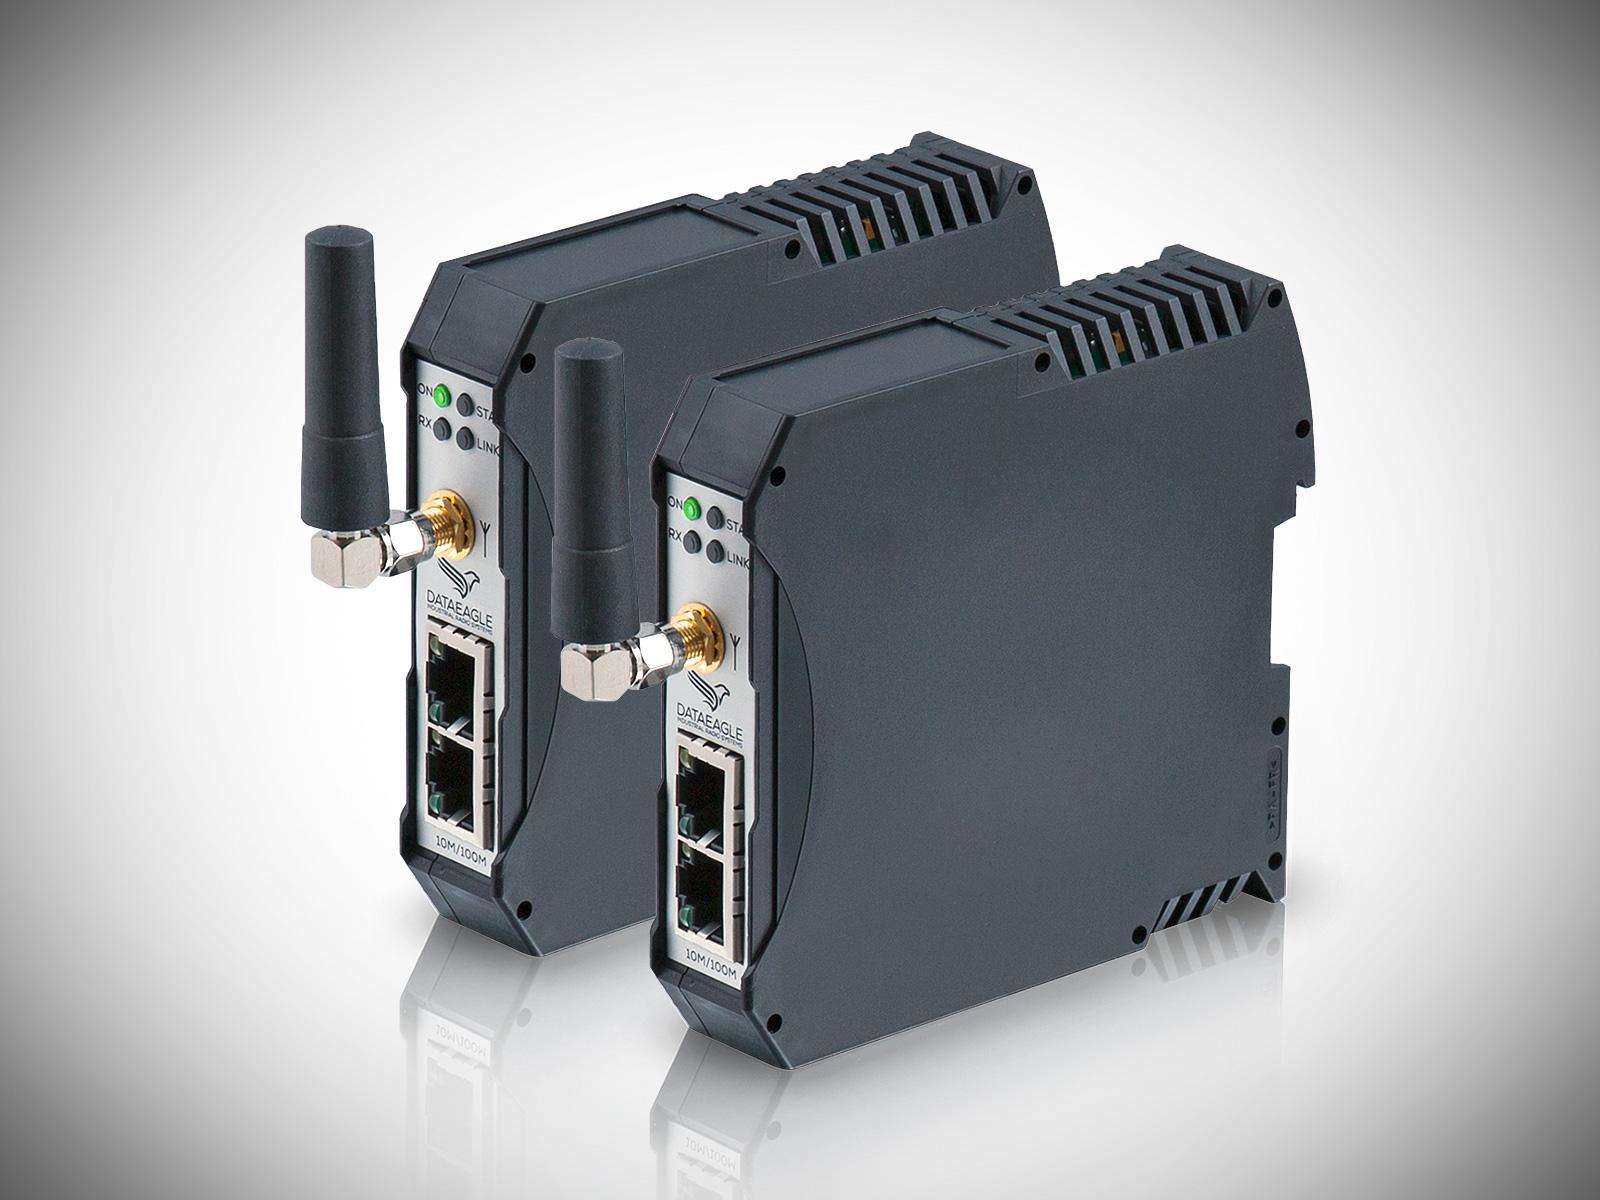 DATAEAGLE 2730 Compact • Über Bluetooth Low Energy vom Sensor in die Steuerung